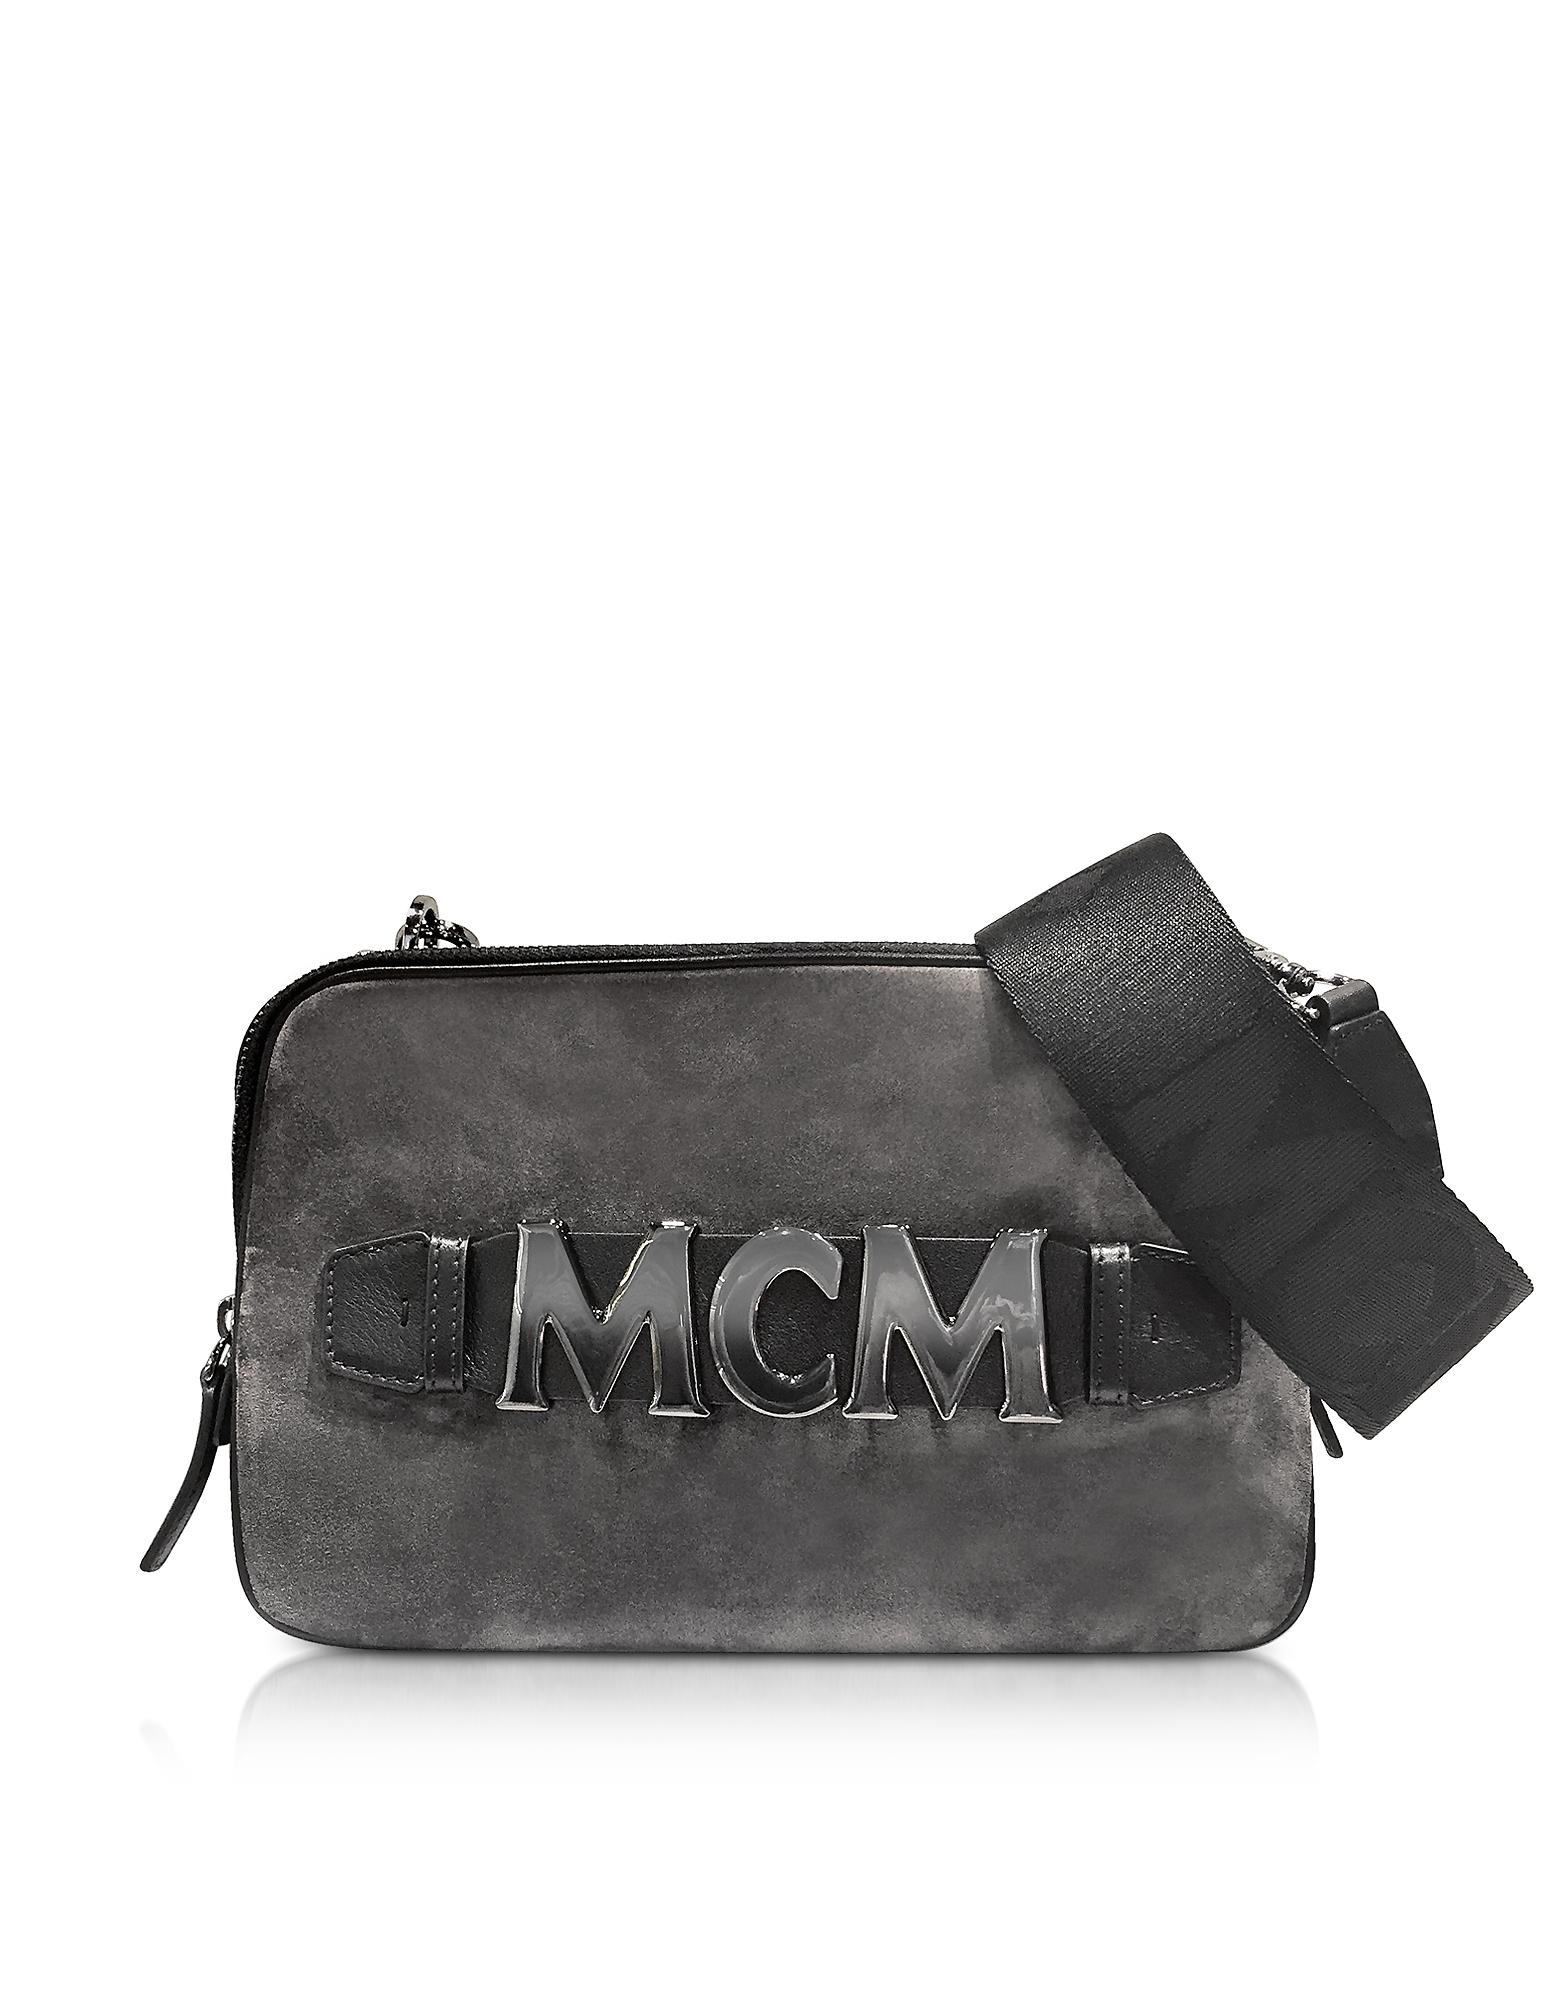 MCM Handbags, Phantom Grey Suede Cubism Medium Crossbody Bag